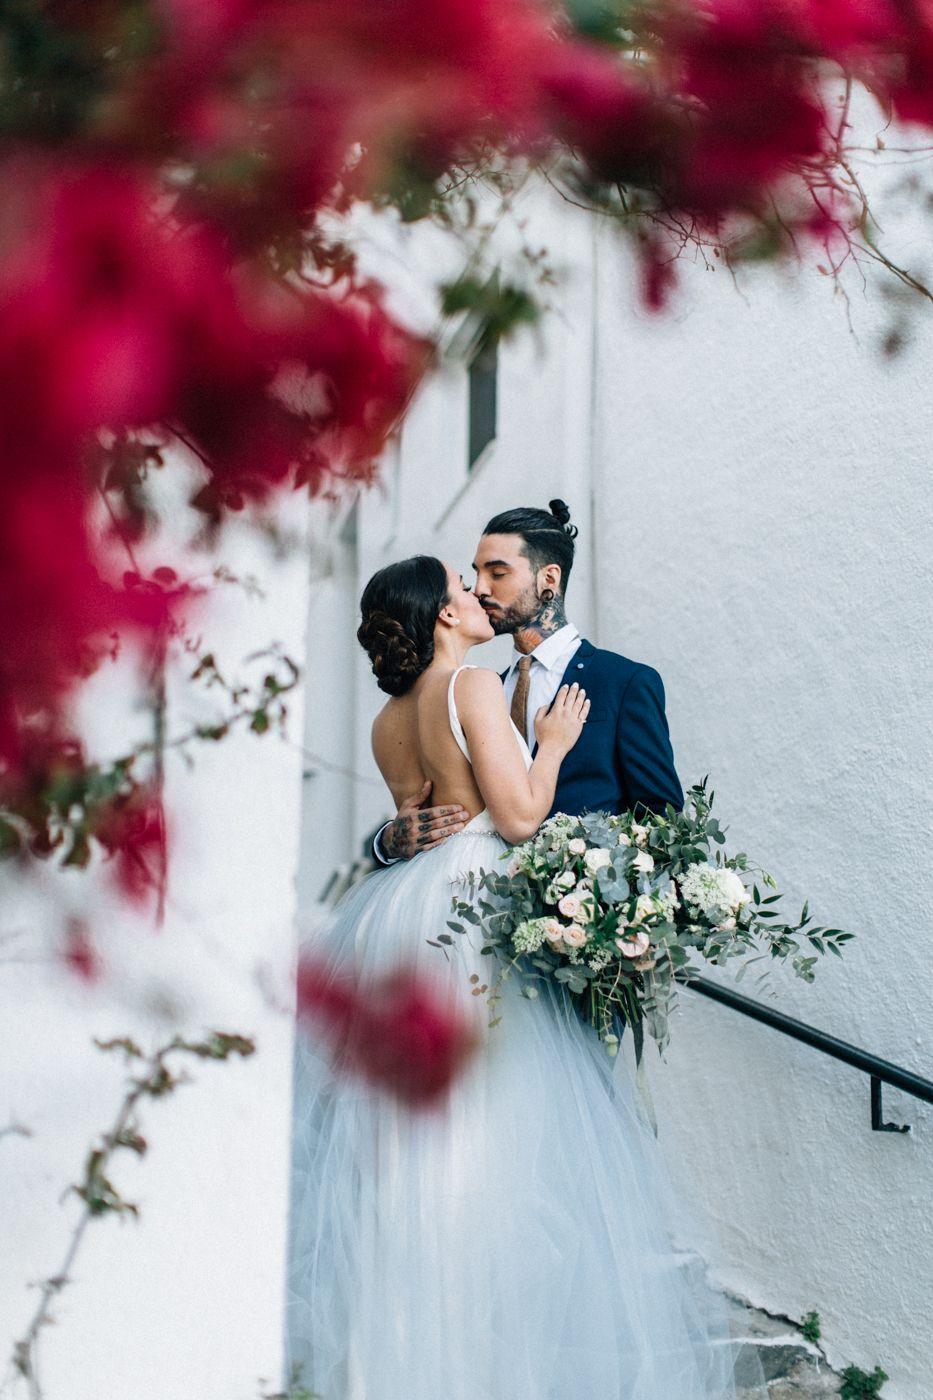 Four Corners Photography Best Atlanta Wedding Photographer Cadaques Elopement In